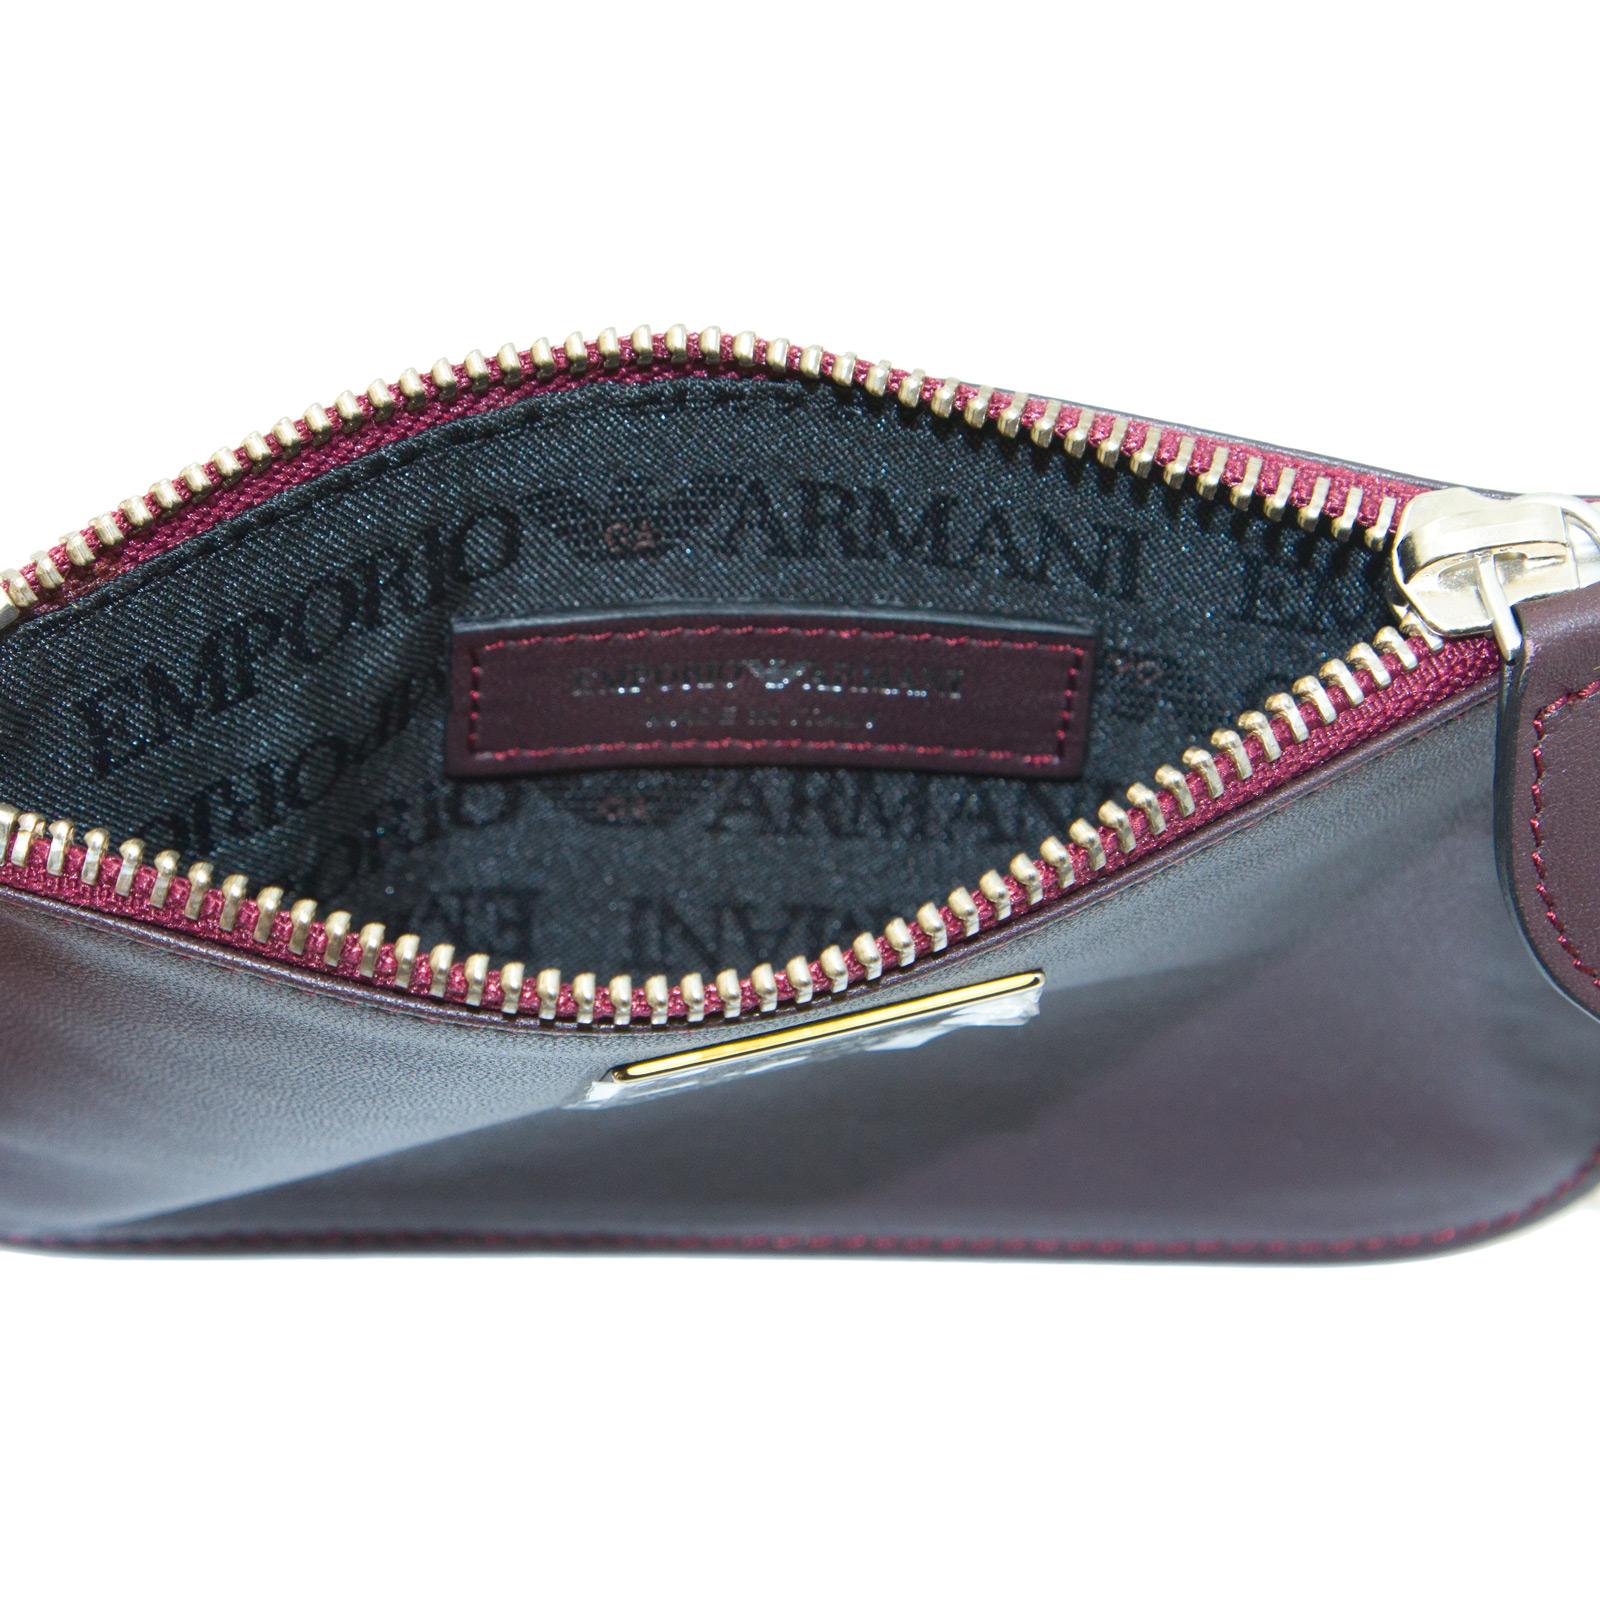 EMPORIO-ARMANI-Women-039-s-034-2012-034-Zip-Top-Coin-Purse-Wallet-YEMG99-195-NWT thumbnail 13